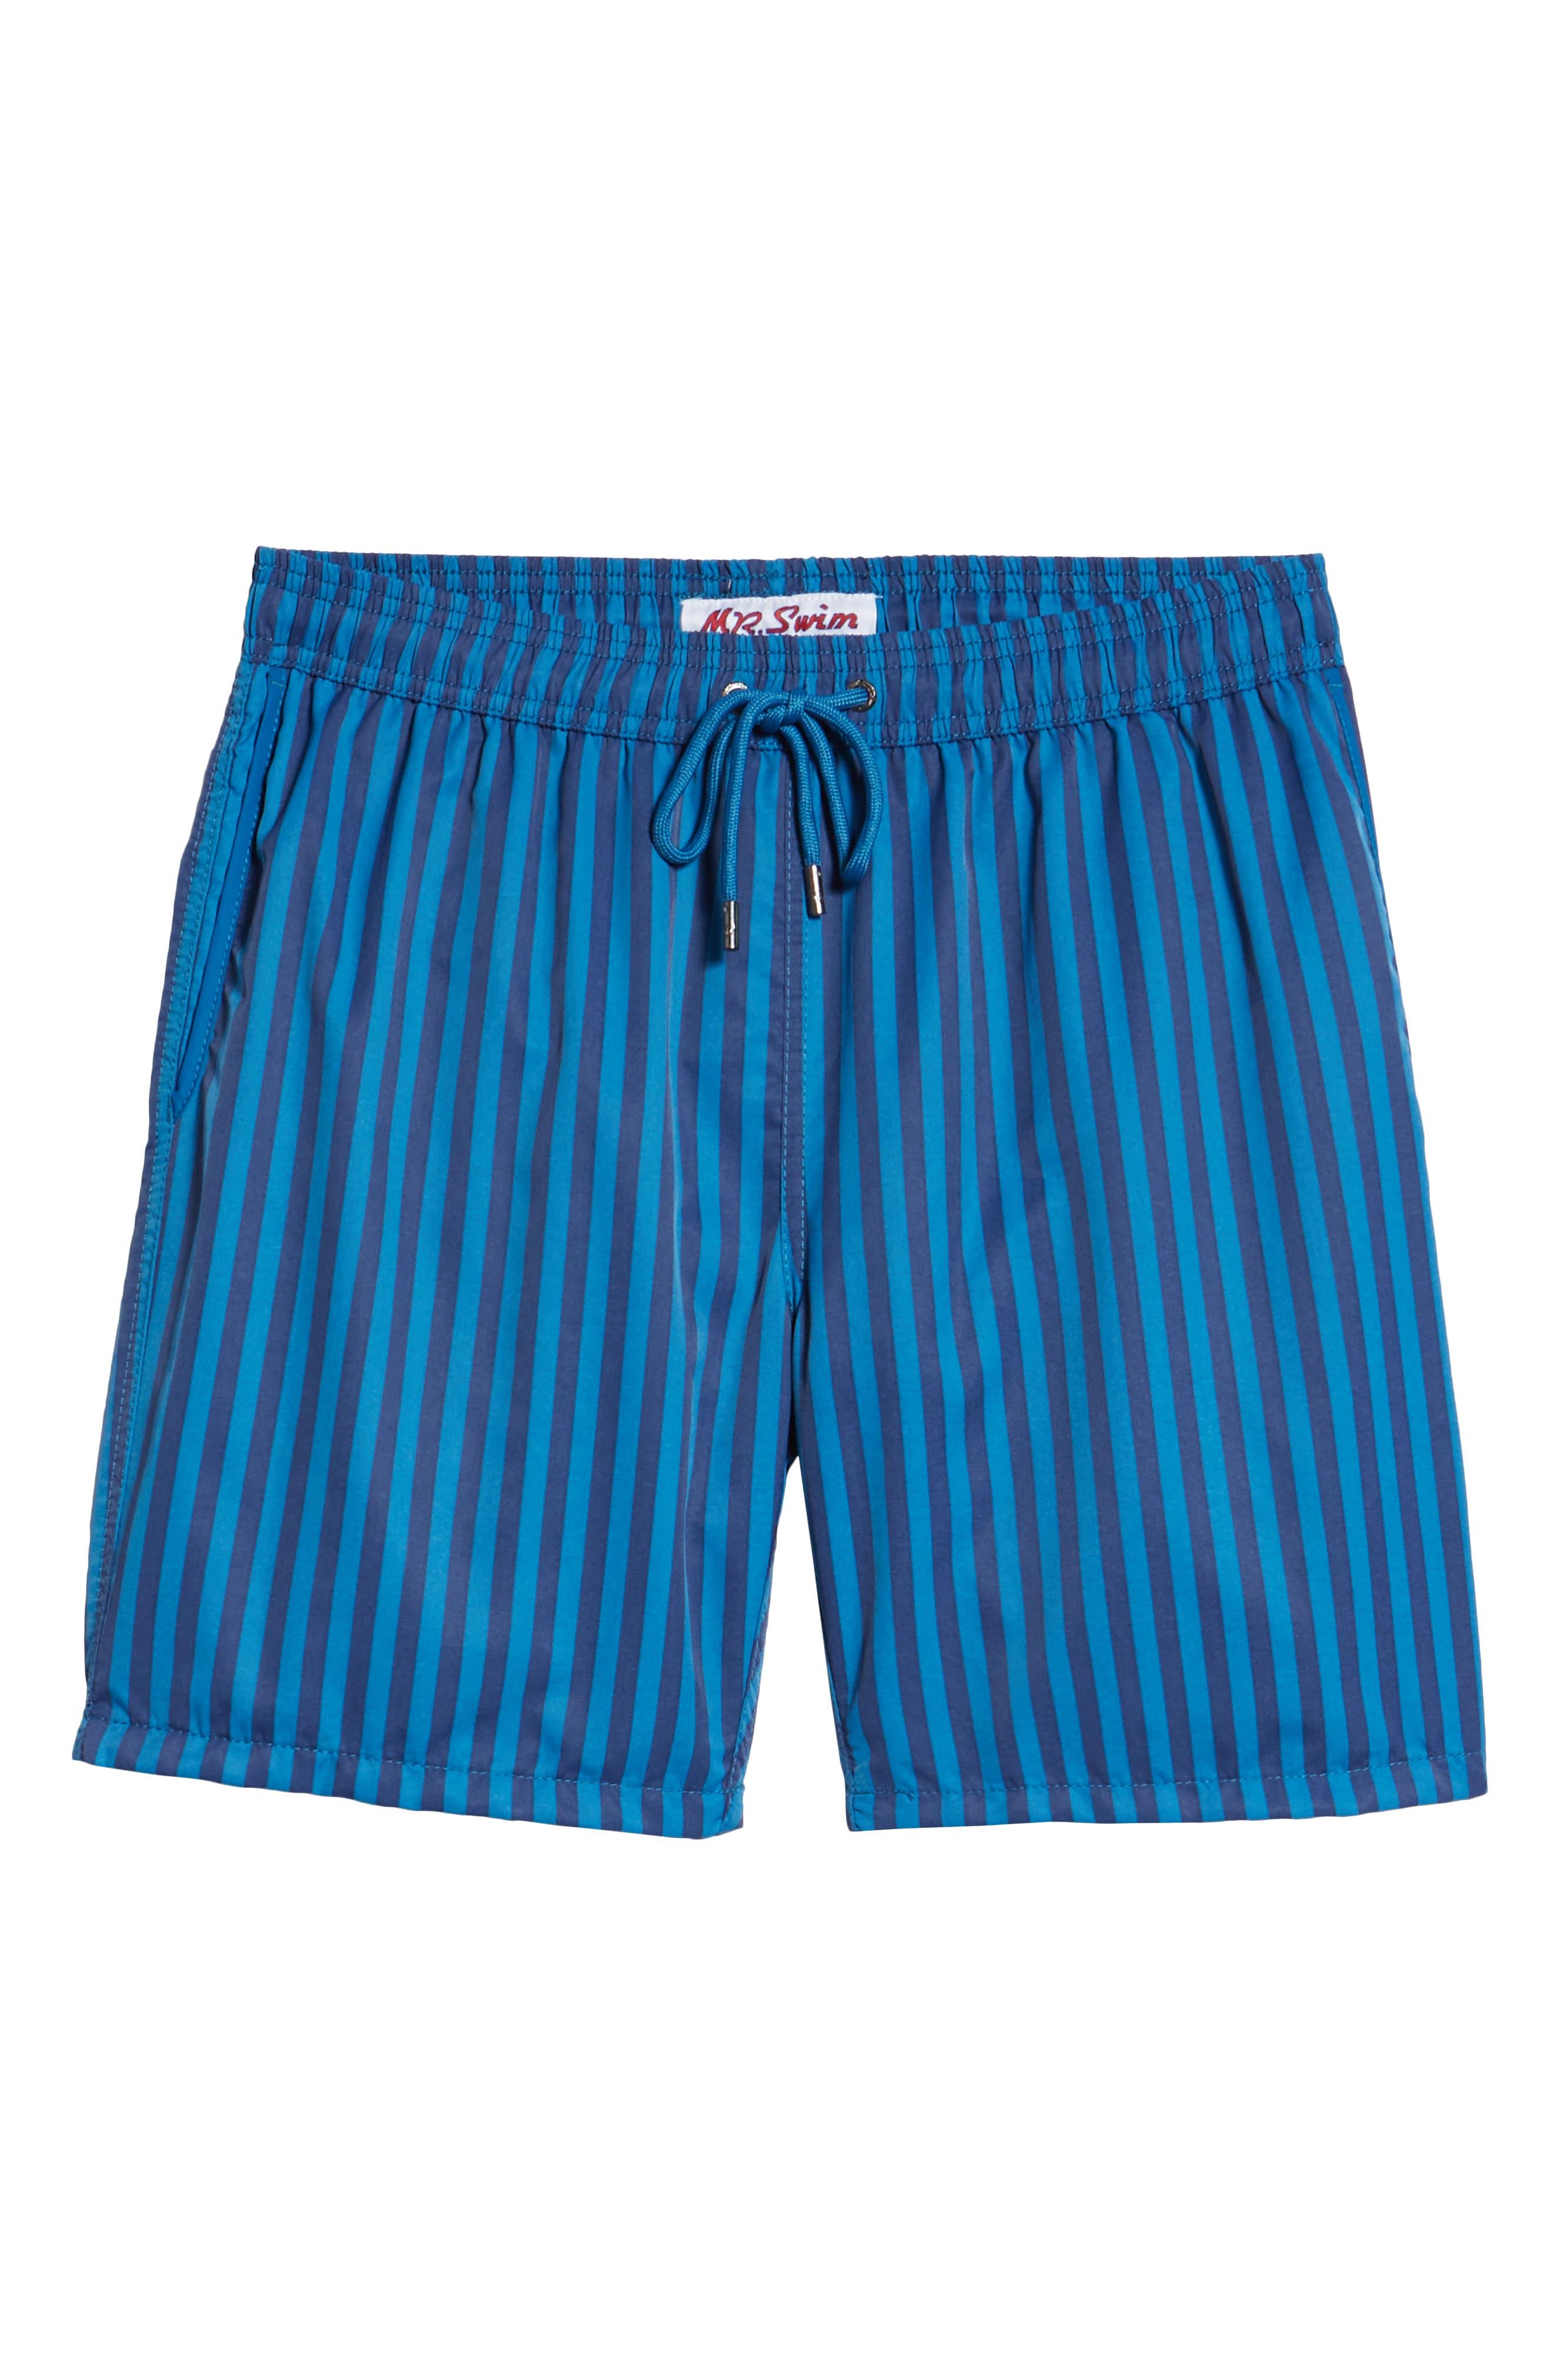 Mr. Swim Cabana Stripe Swim Trunks,                             Alternate thumbnail 6, color,                             NAVY/ ROYAL